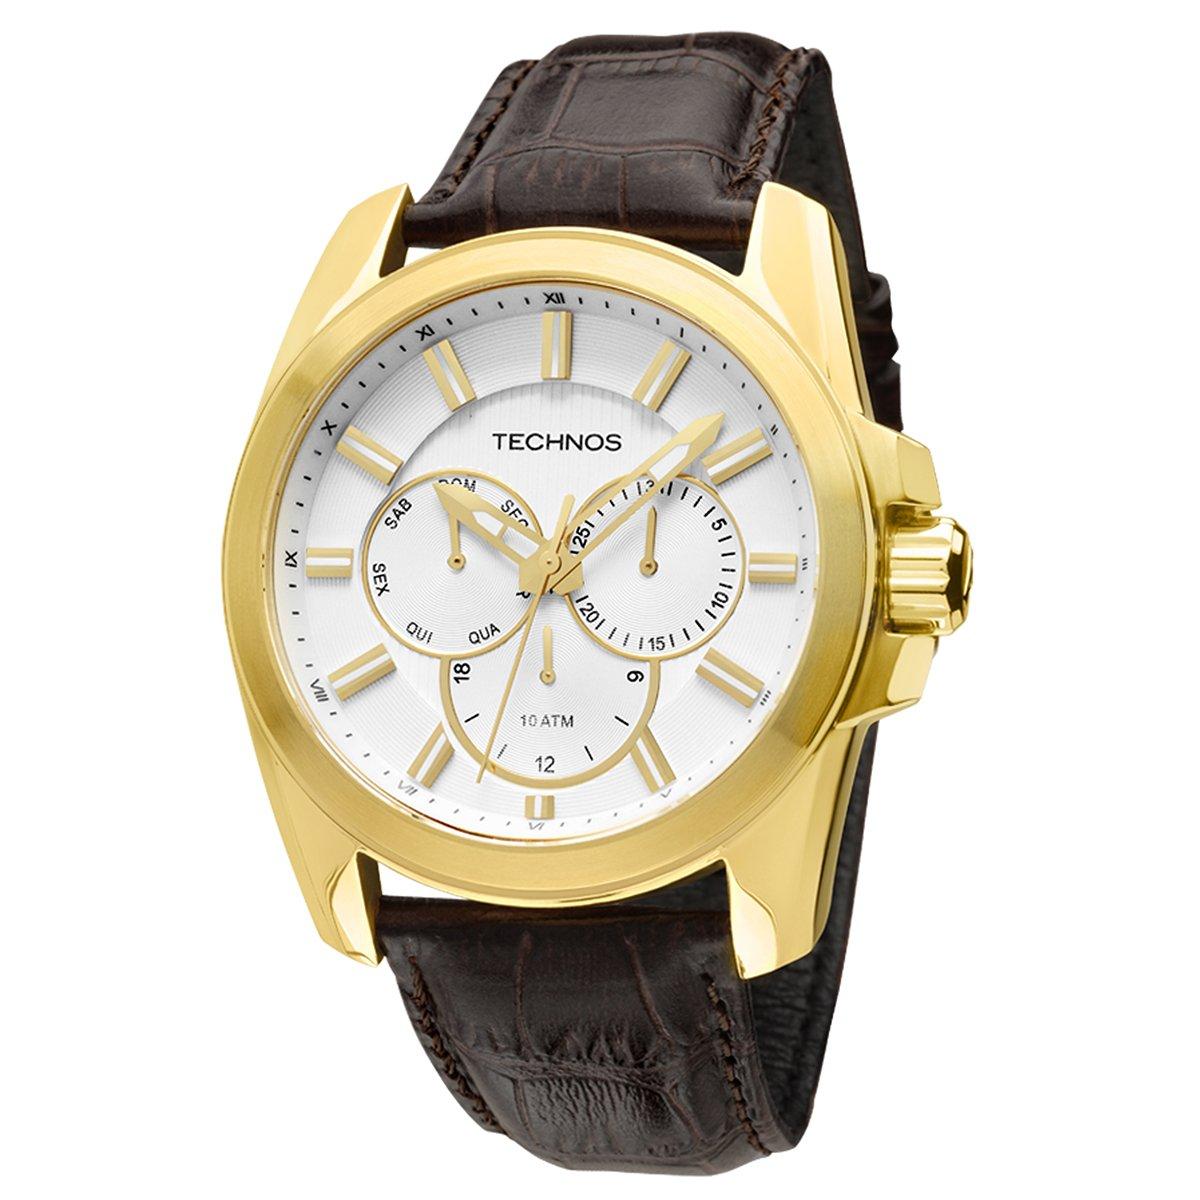 f2bb2893100 Relógio Technos Legacy - Compre Agora